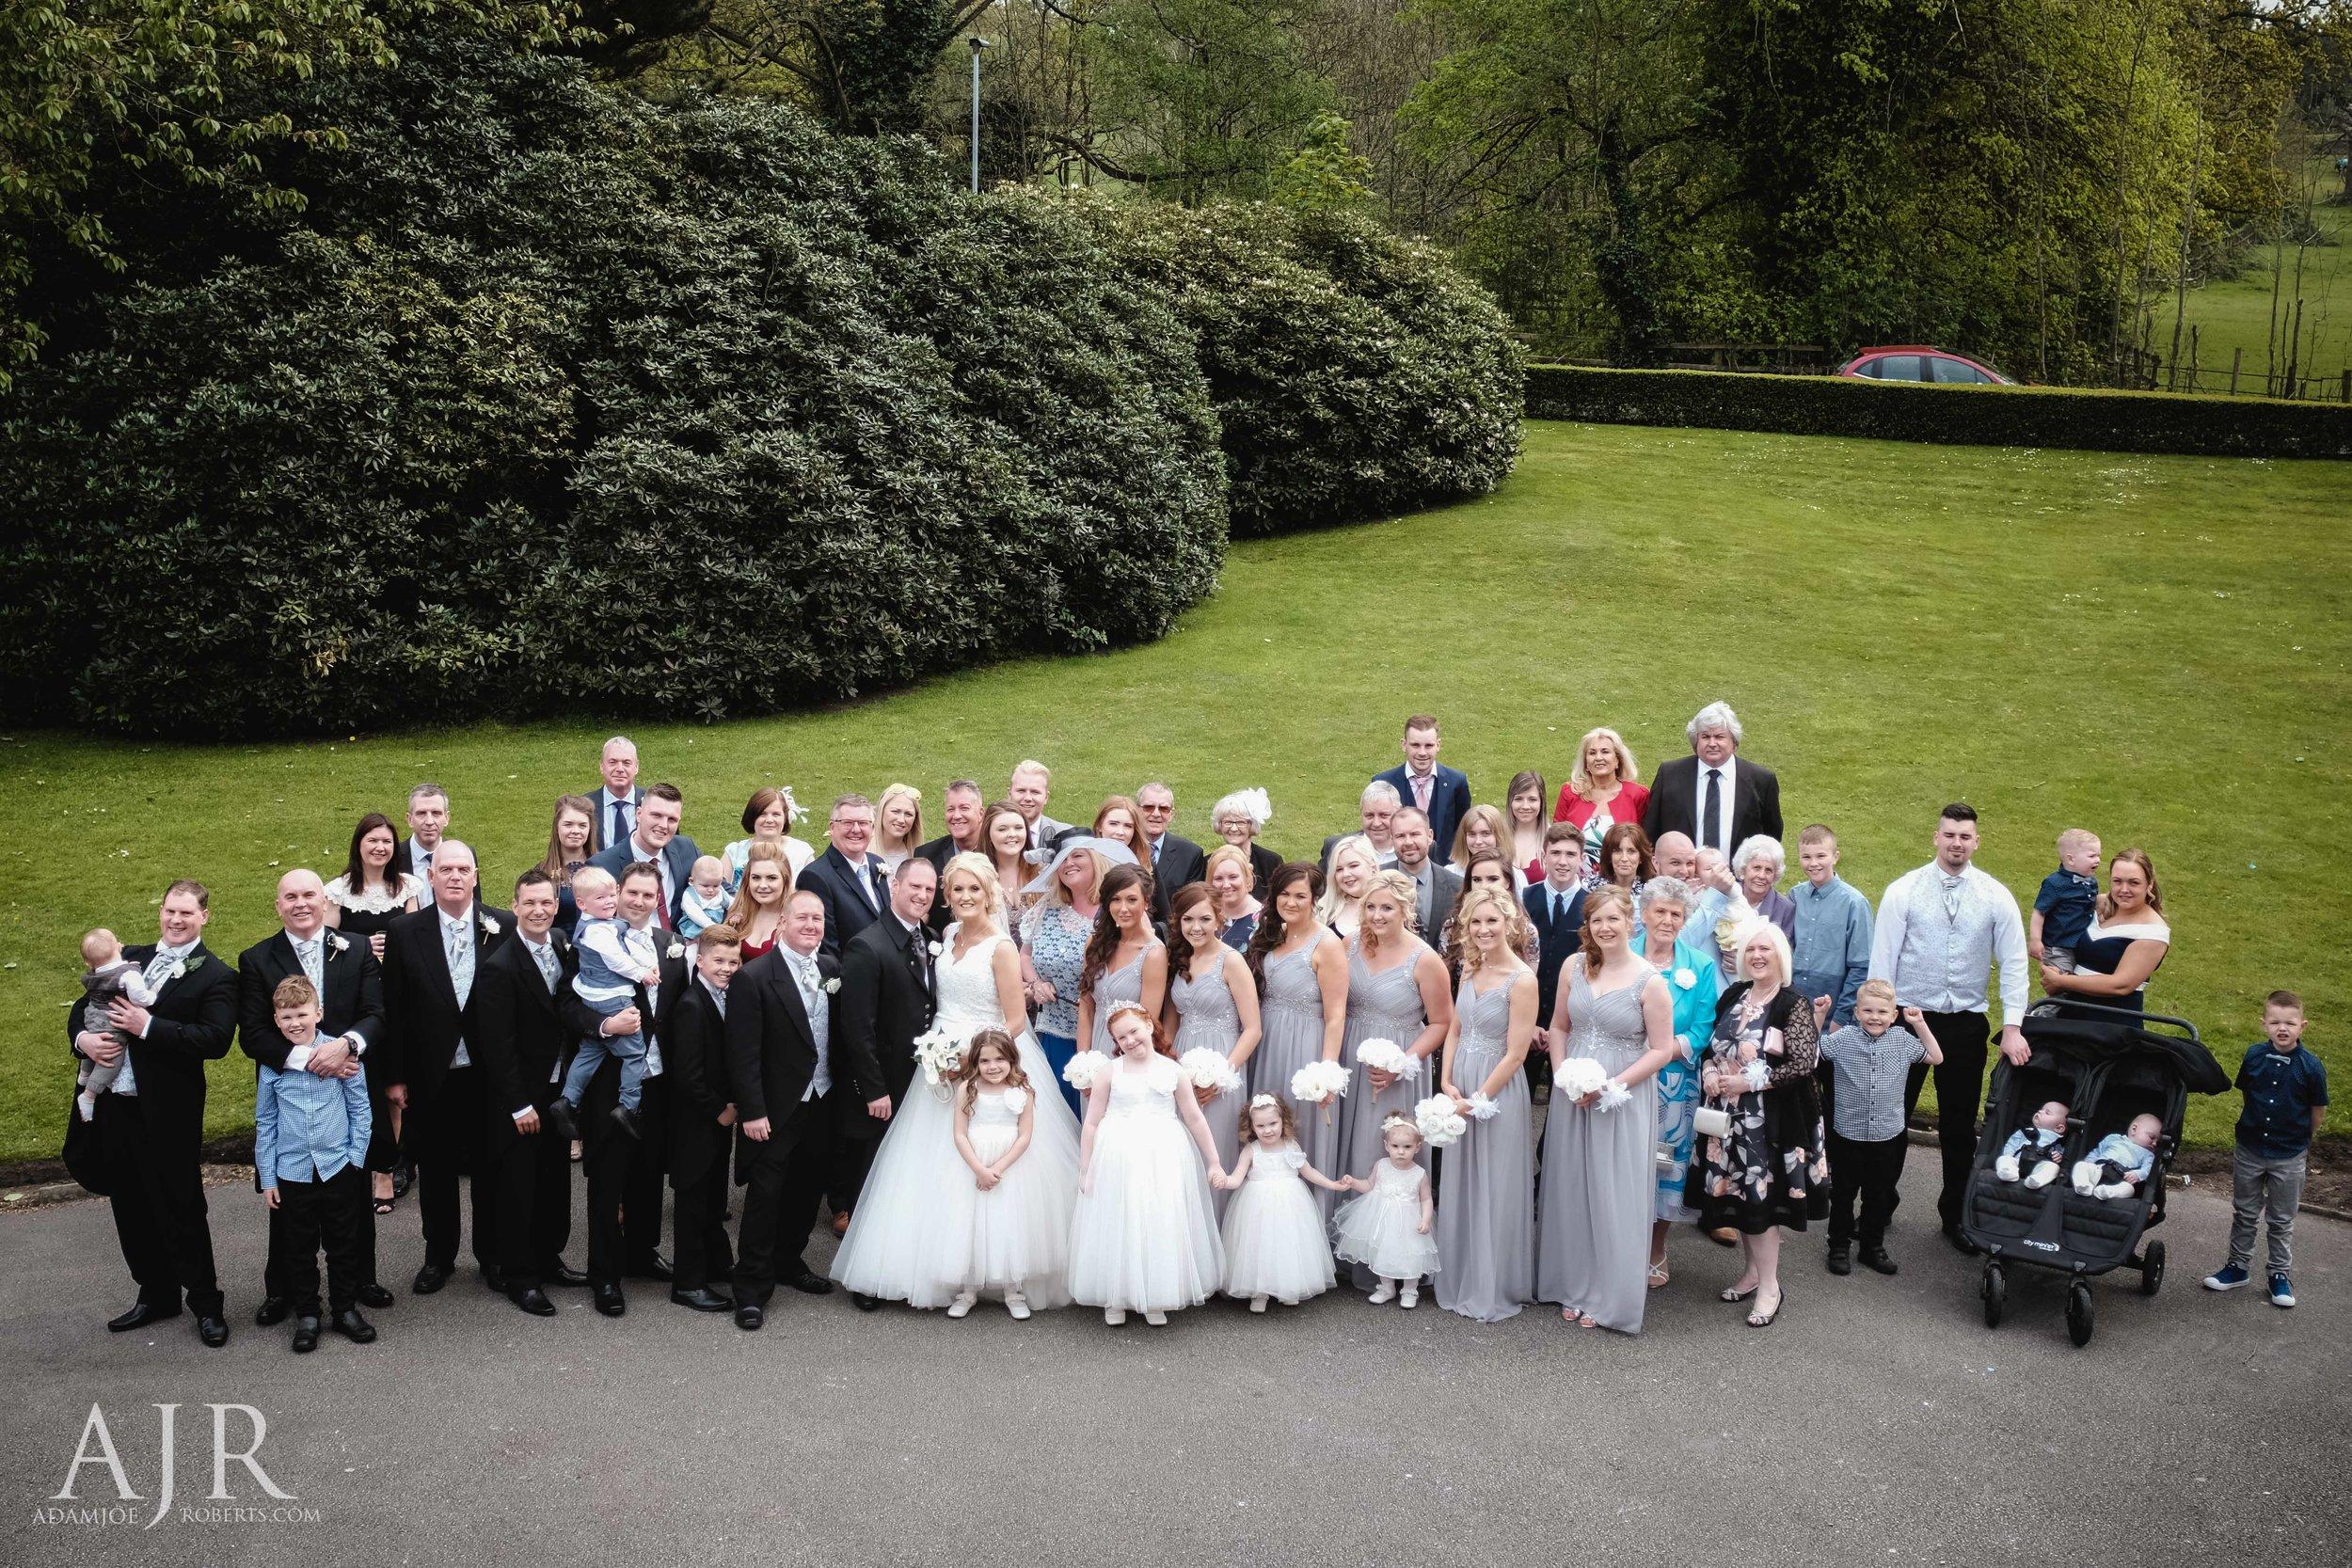 statham lodge wedding photographer cheshire wedding photographer (10 of 11).jpg